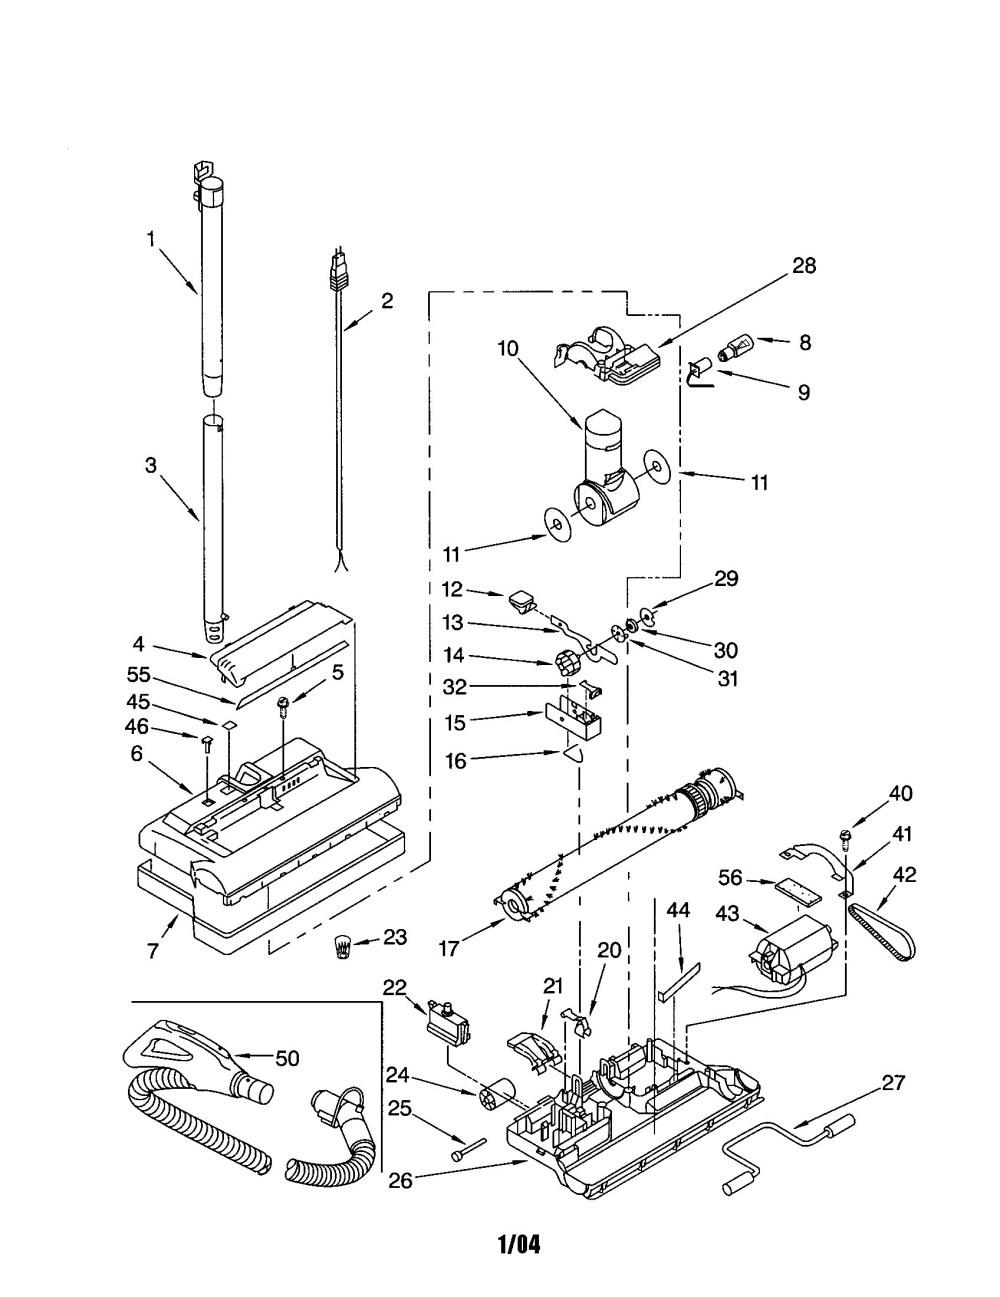 medium resolution of shop vac wiring diagram wiring library sanitaire vacuum parts diagram kenmore vacuum wiring diagram wire center